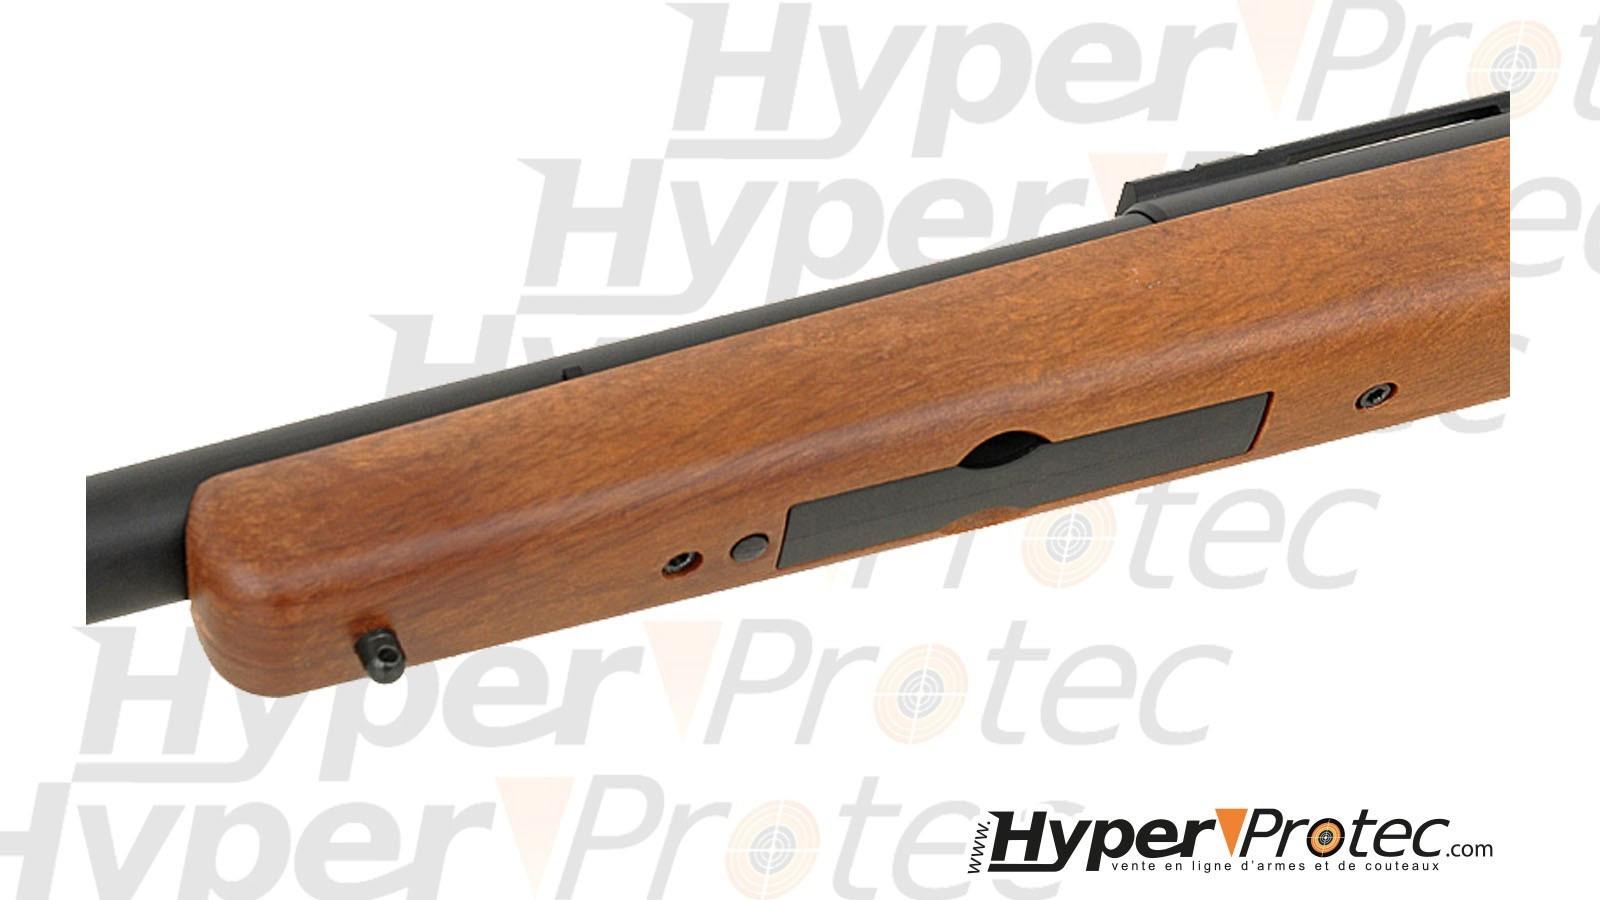 Merveilleux Hyperprotec